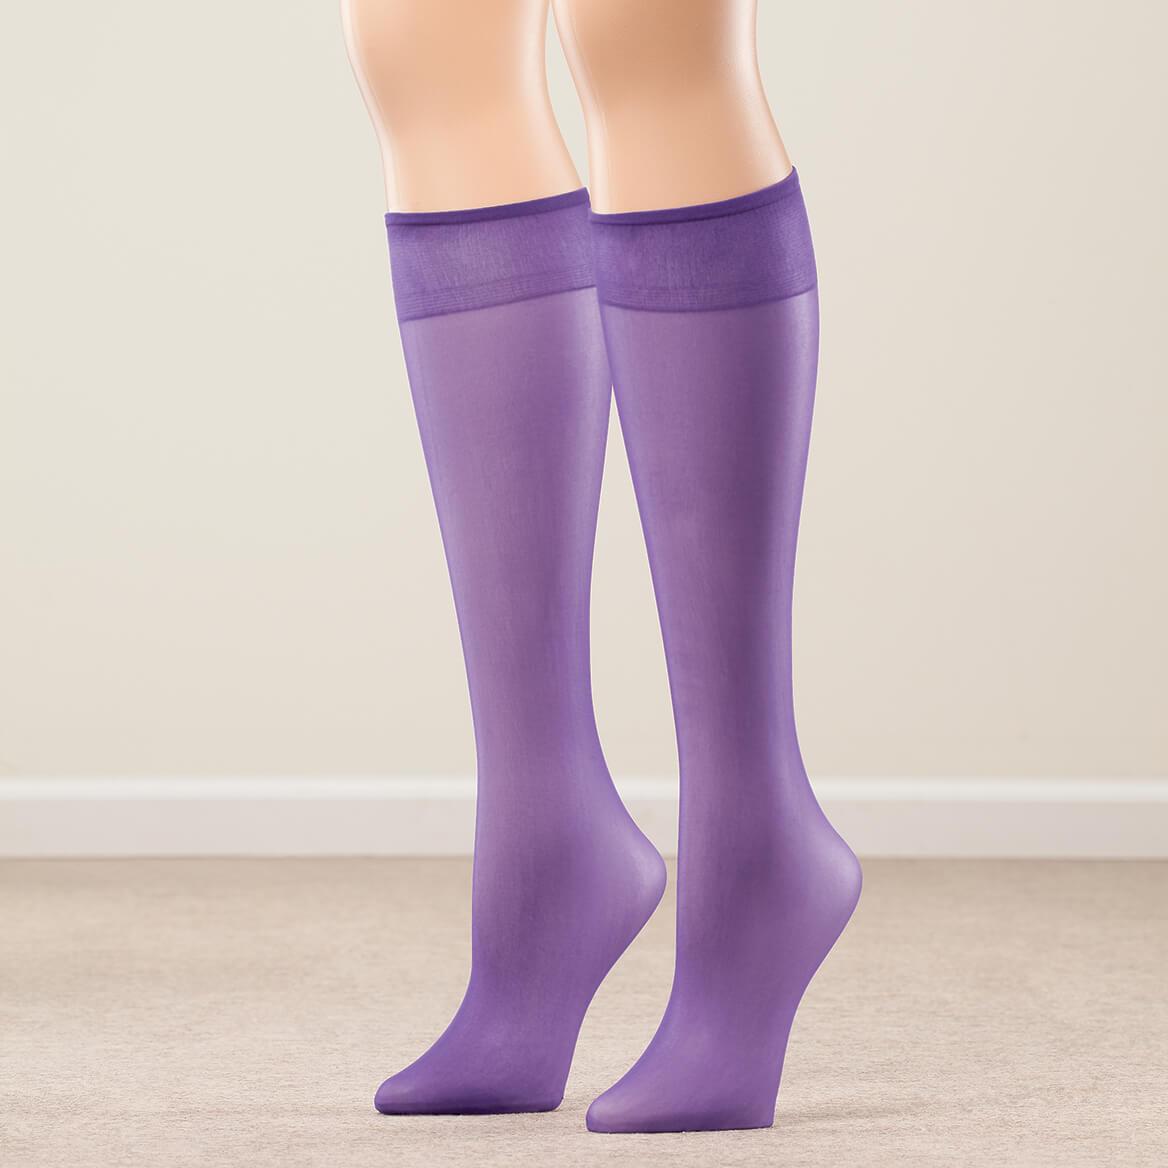 Nylon Knee Highs, Set of 20 Pairs-367416